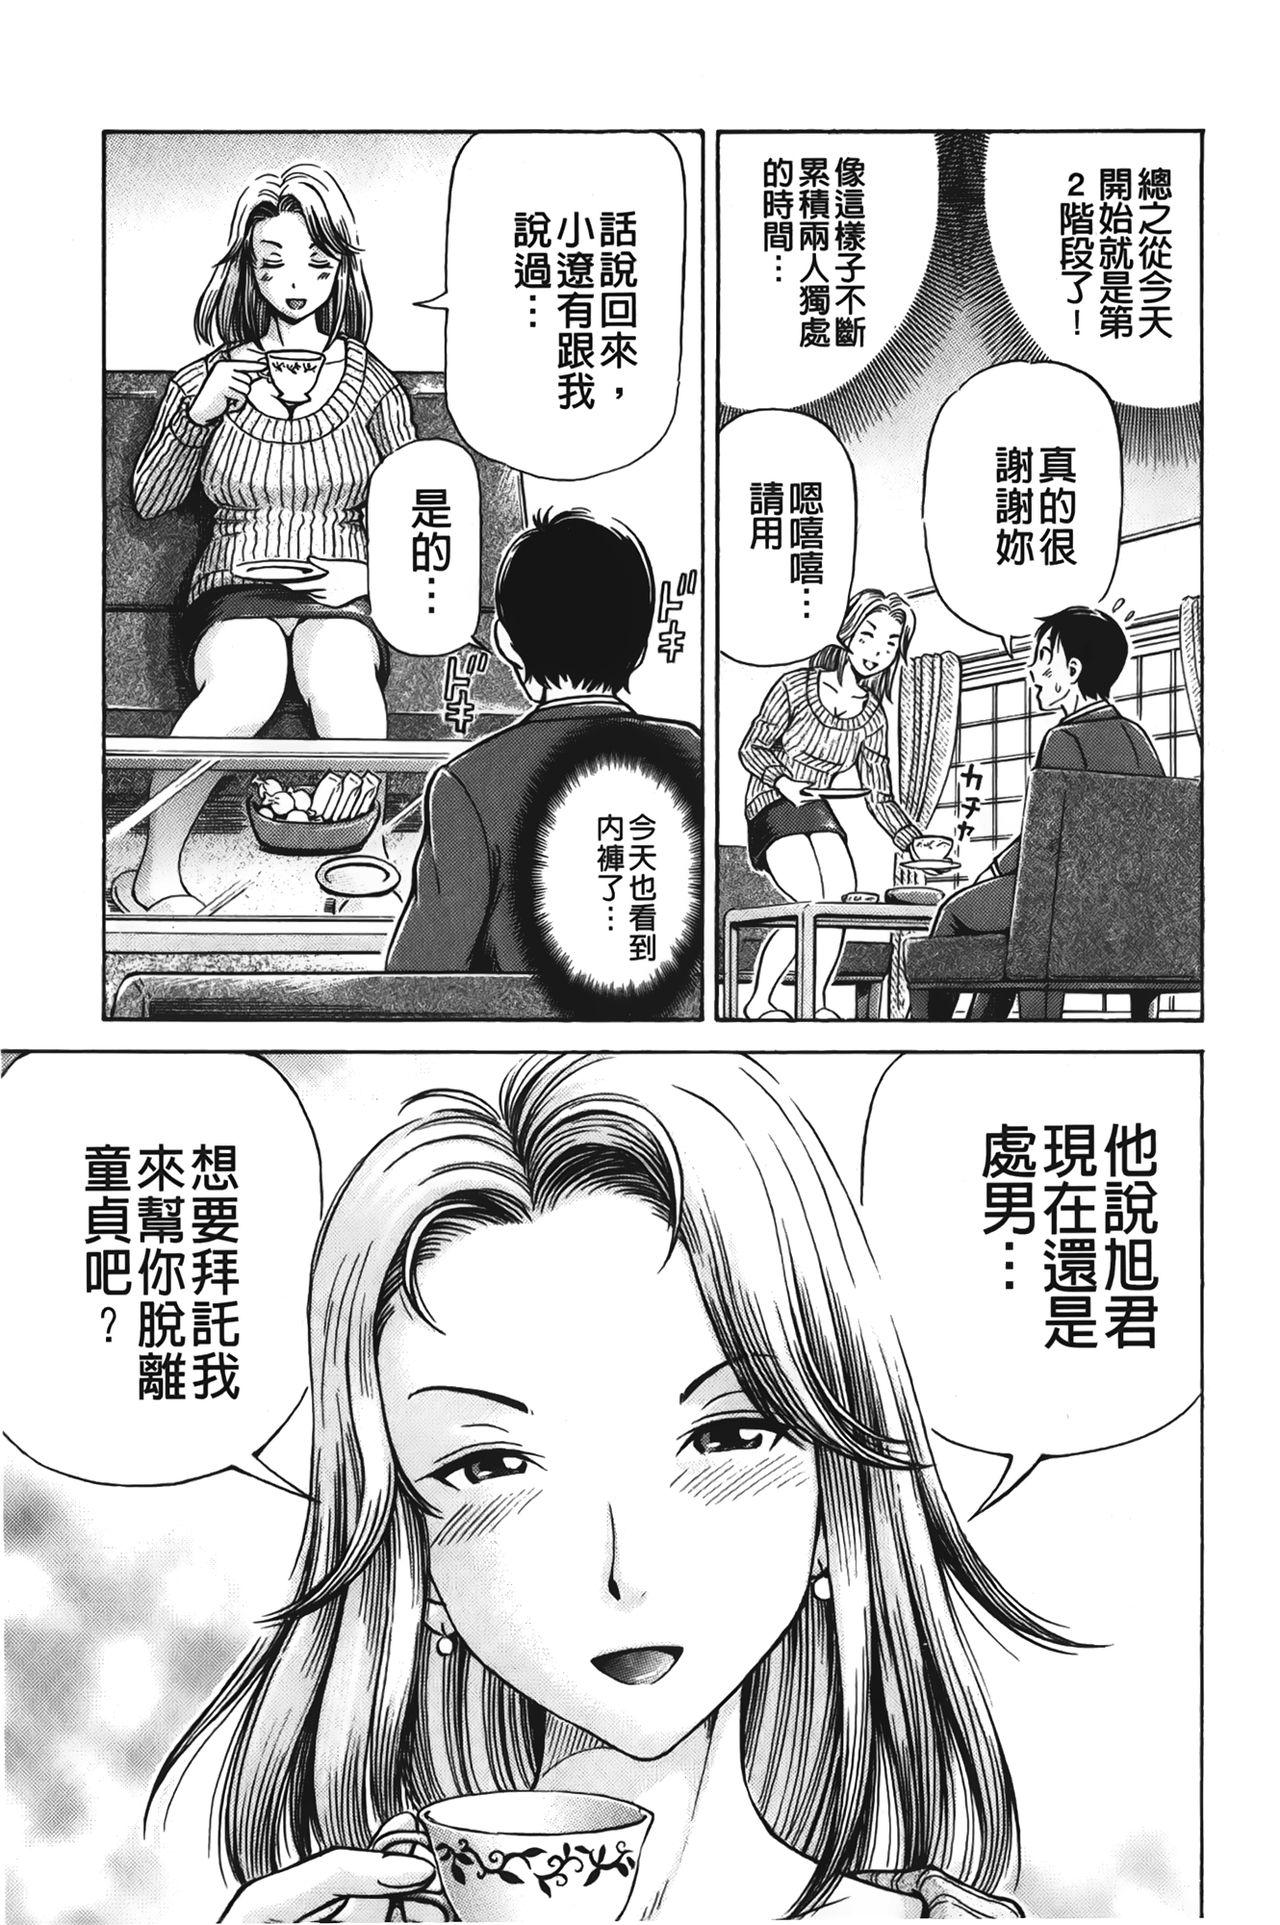 pookori meikingu | 懷孕少女的製造者 81